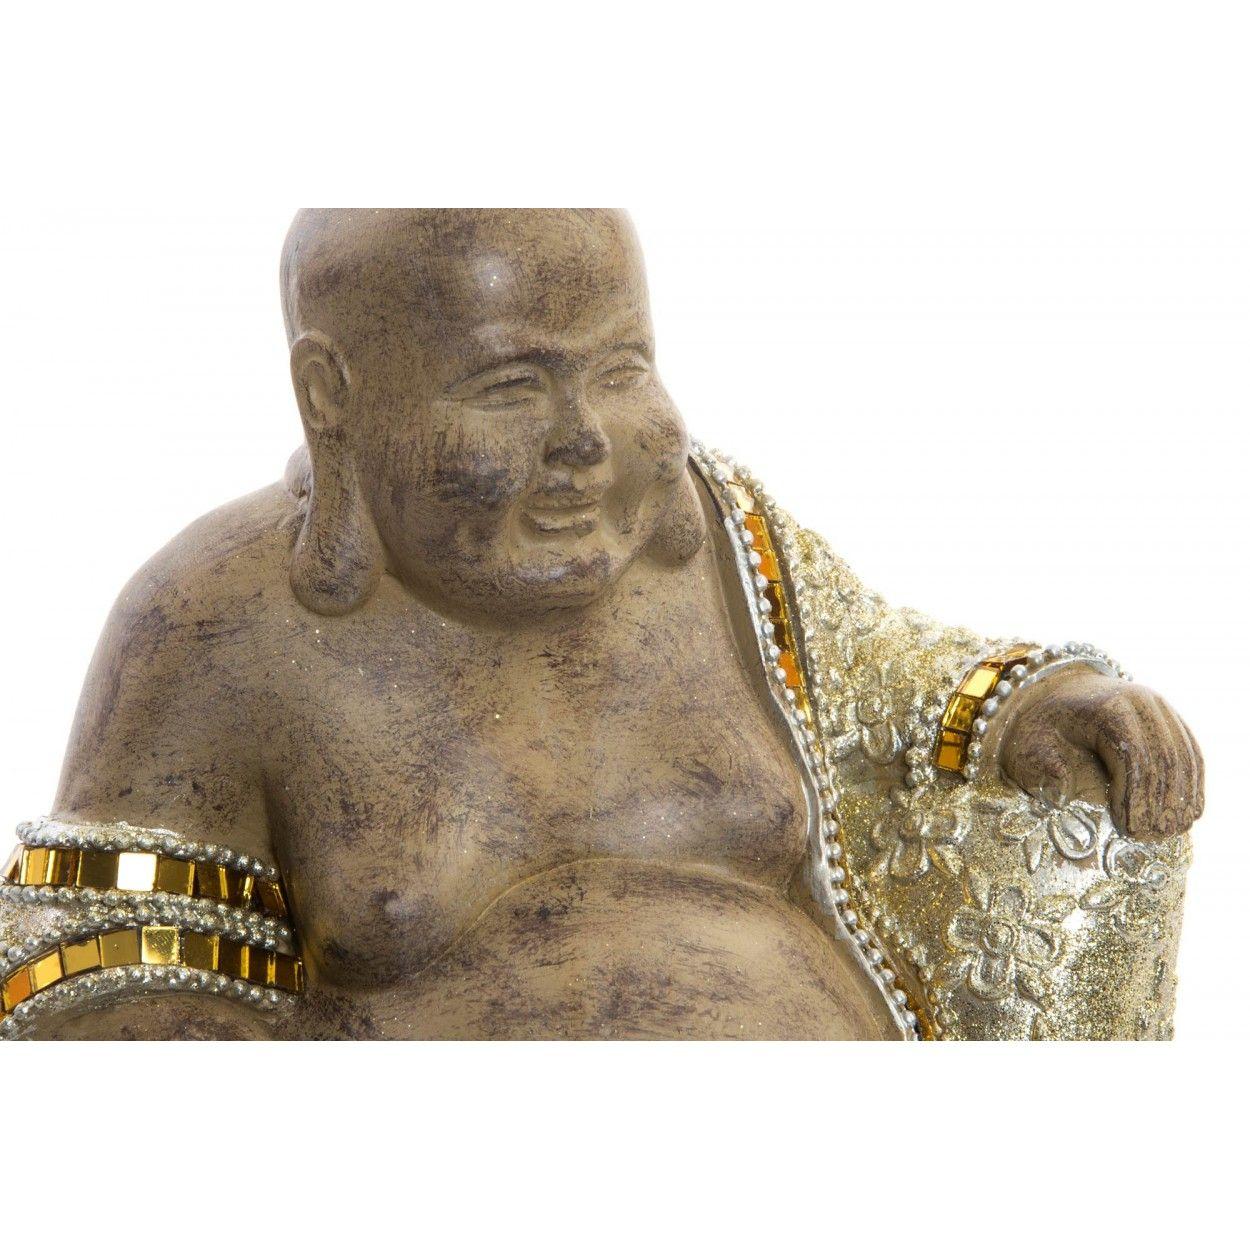 Figura De Buda Wabi Sabi Sentado Para Jardin O Zona De Relajacion